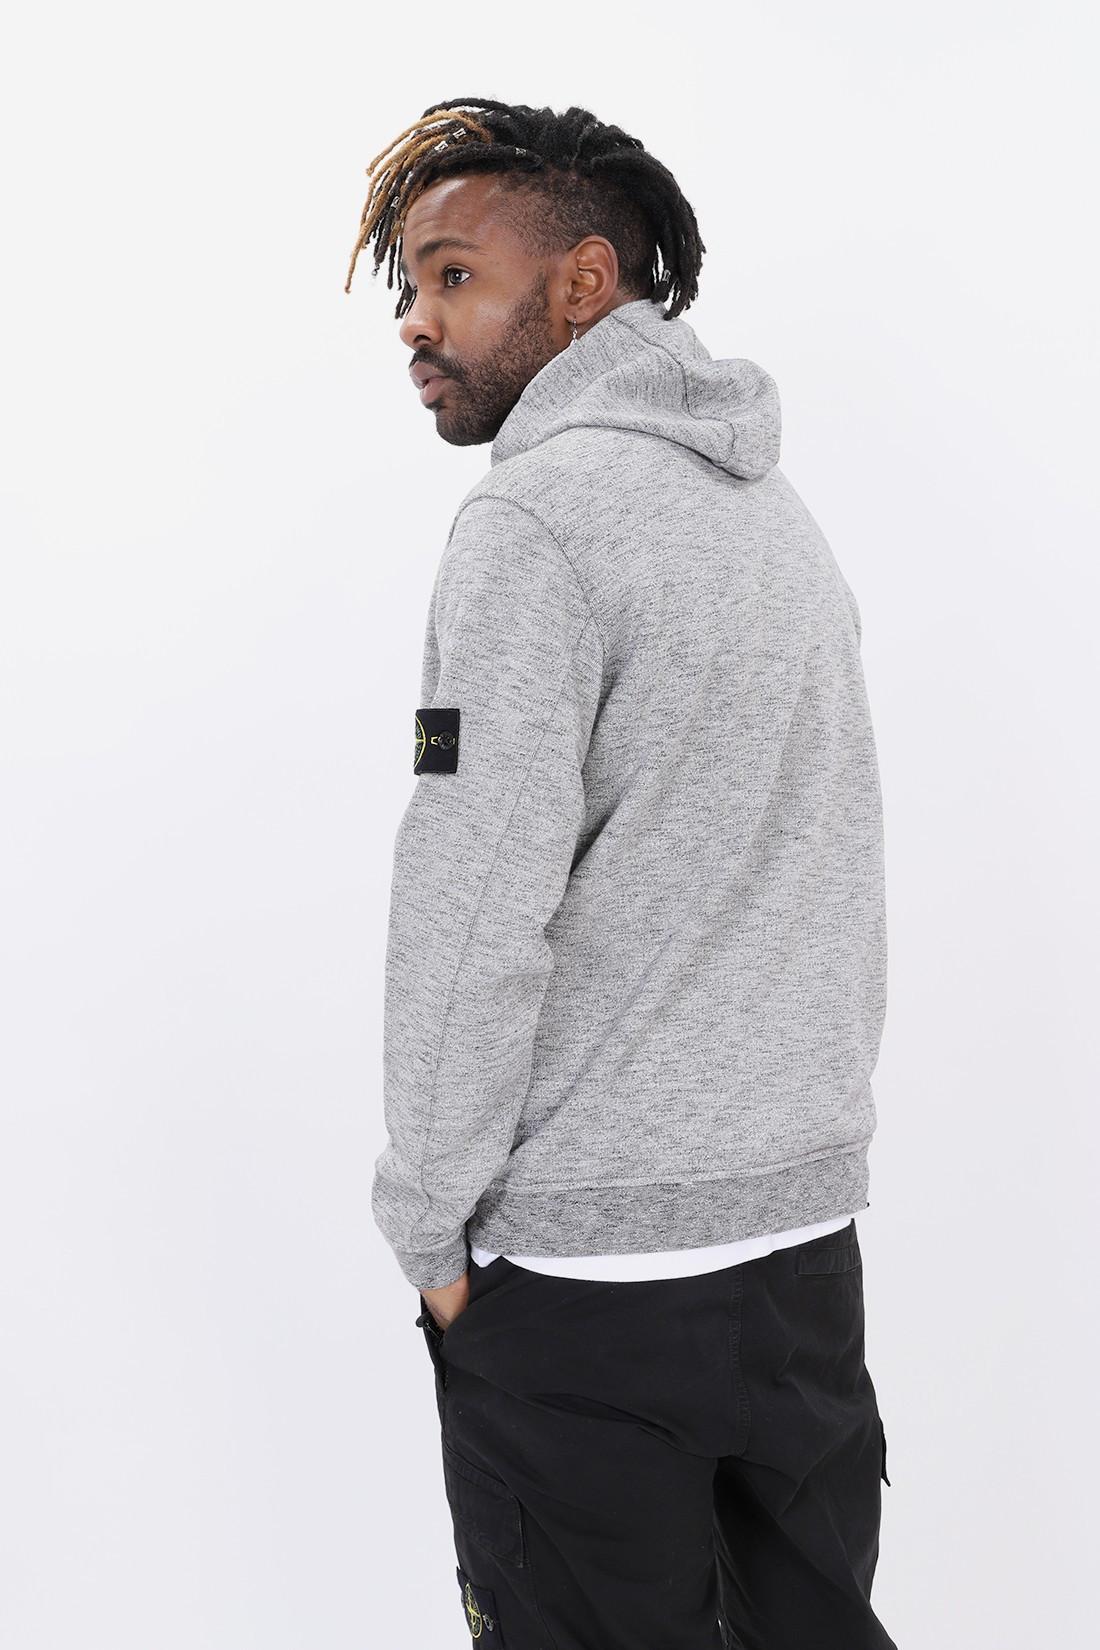 STONE ISLAND / 62838 hooded zip jacket v0060 Grigio